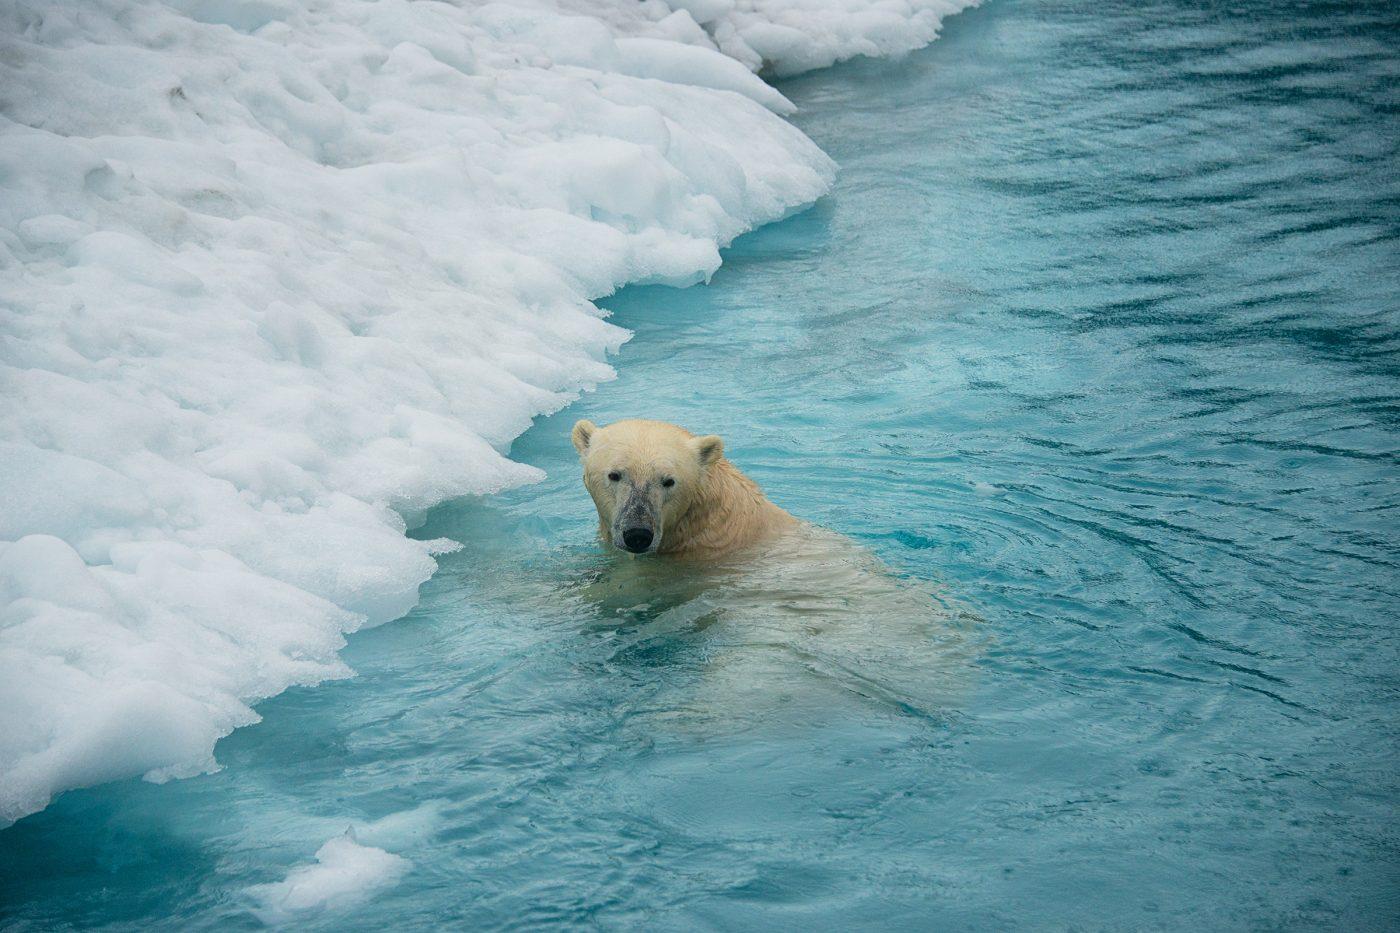 Swimming polar bear. Photo by Andy Mann